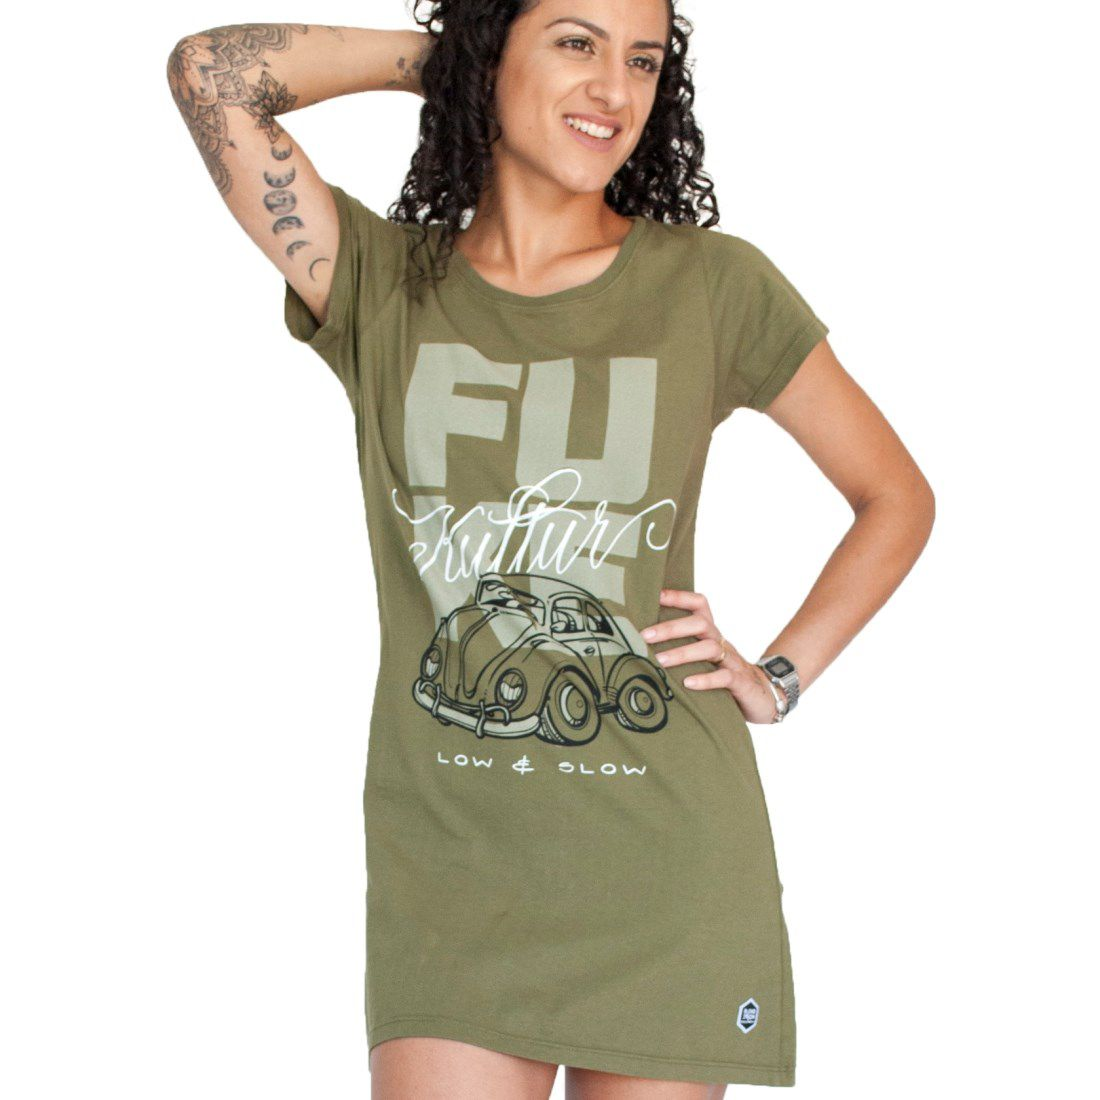 Vestido Feminina - FukeKultur